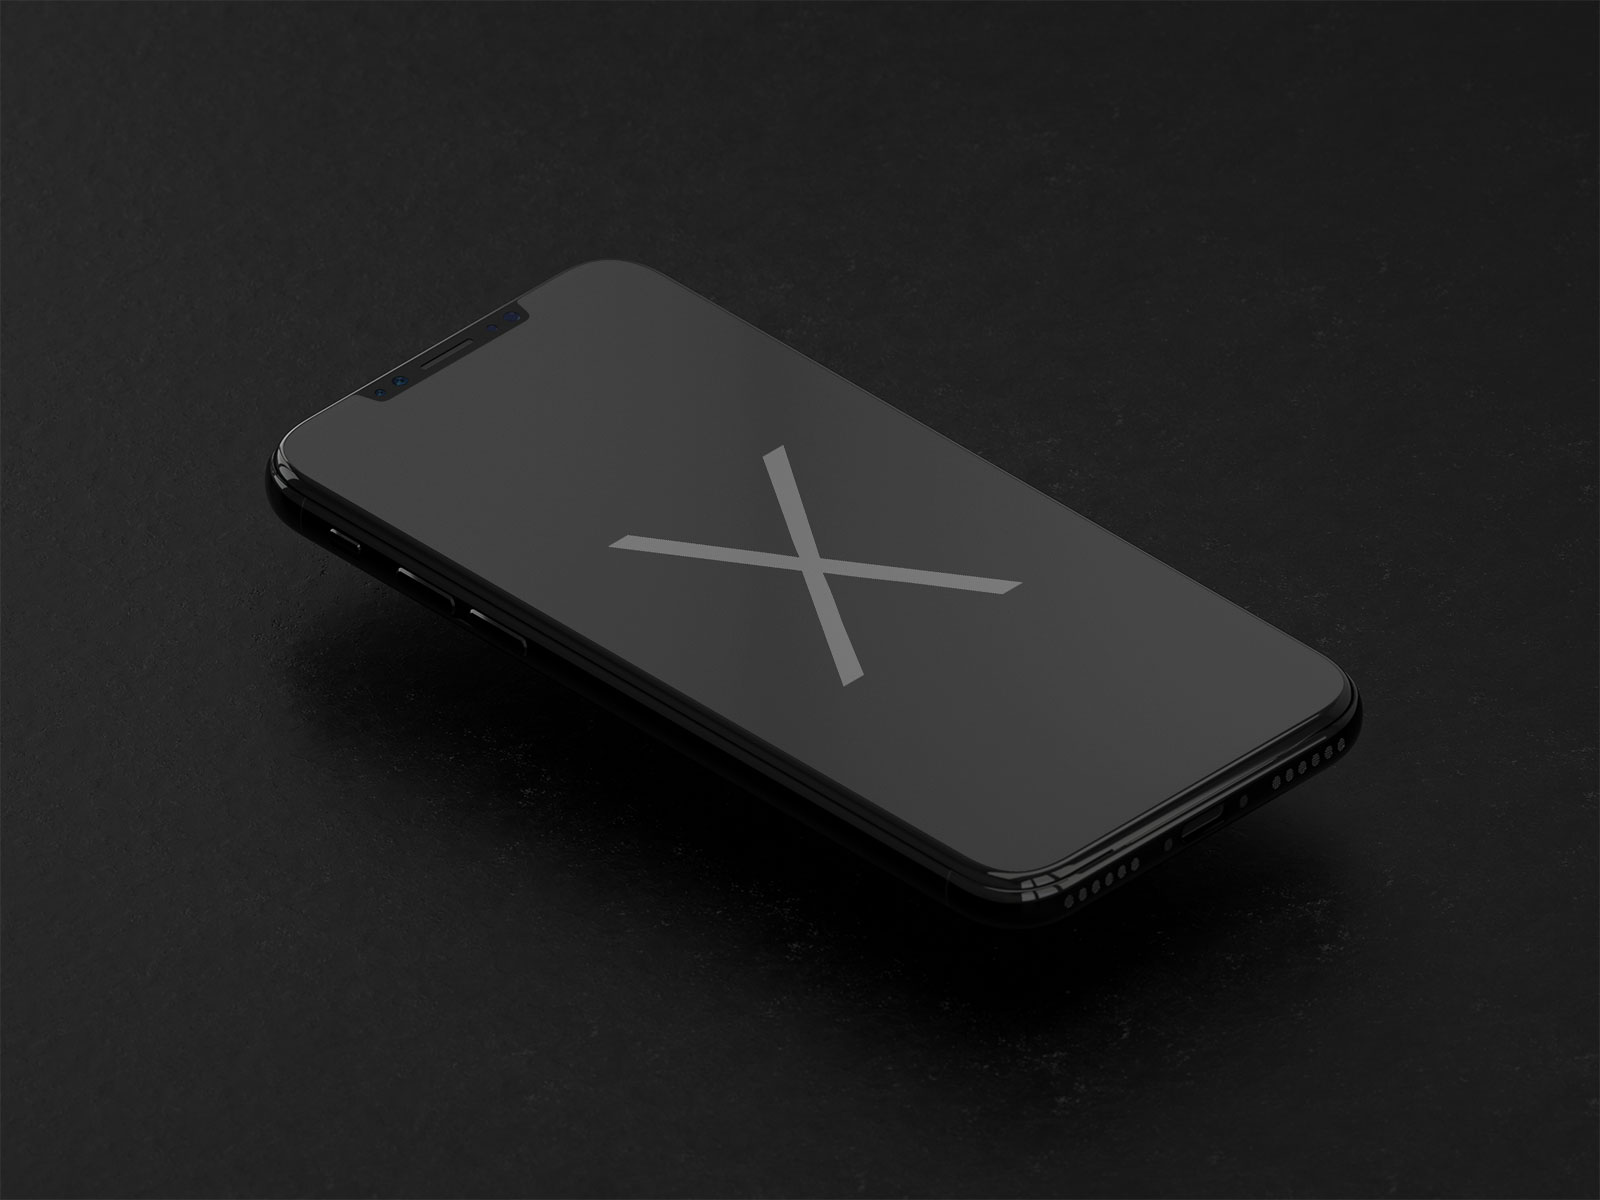 Free Apple iPhone X Black Mockup PSD | 3D Render - Good Mockups